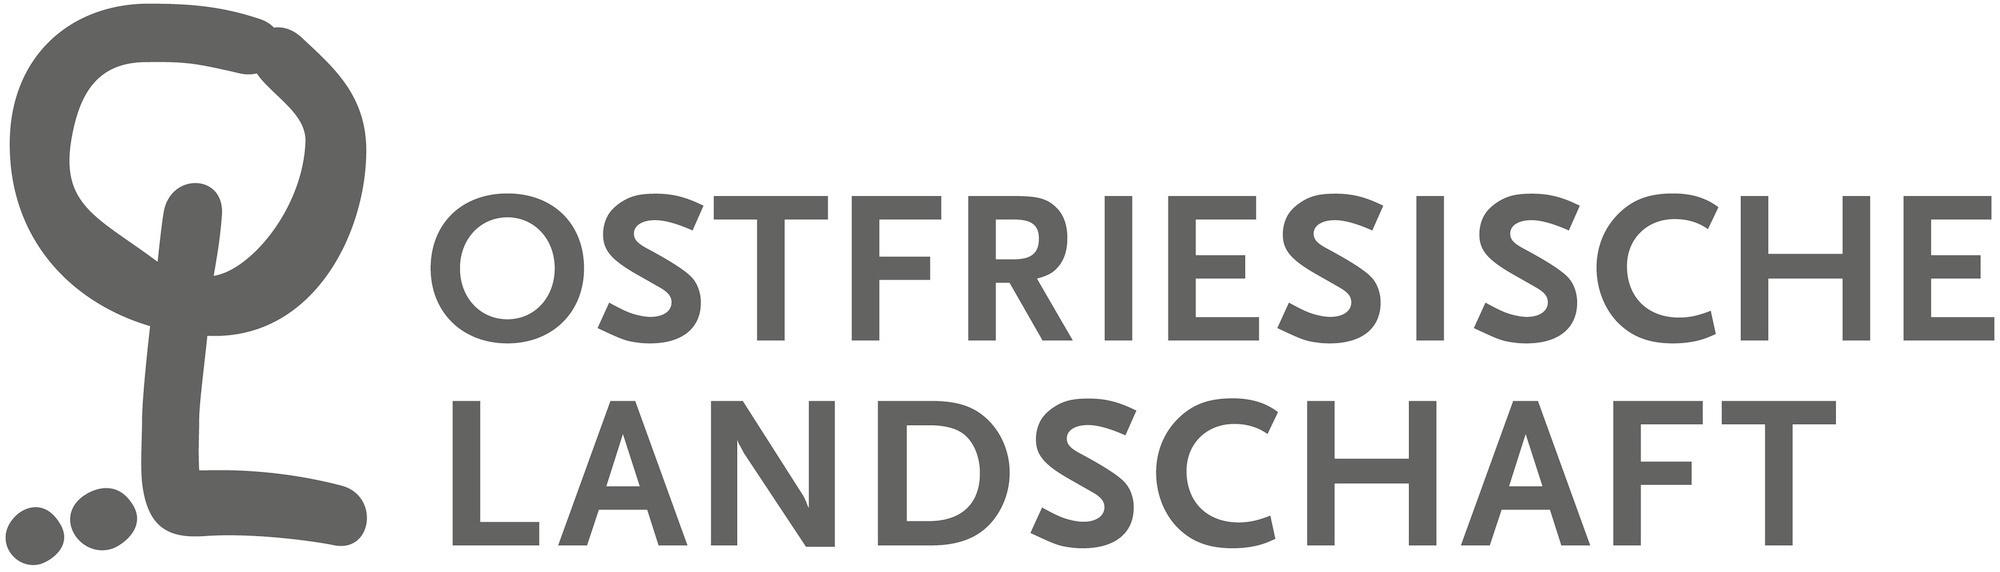 Logo Abschlussveranstaltung zum Erstcheck-Projekt